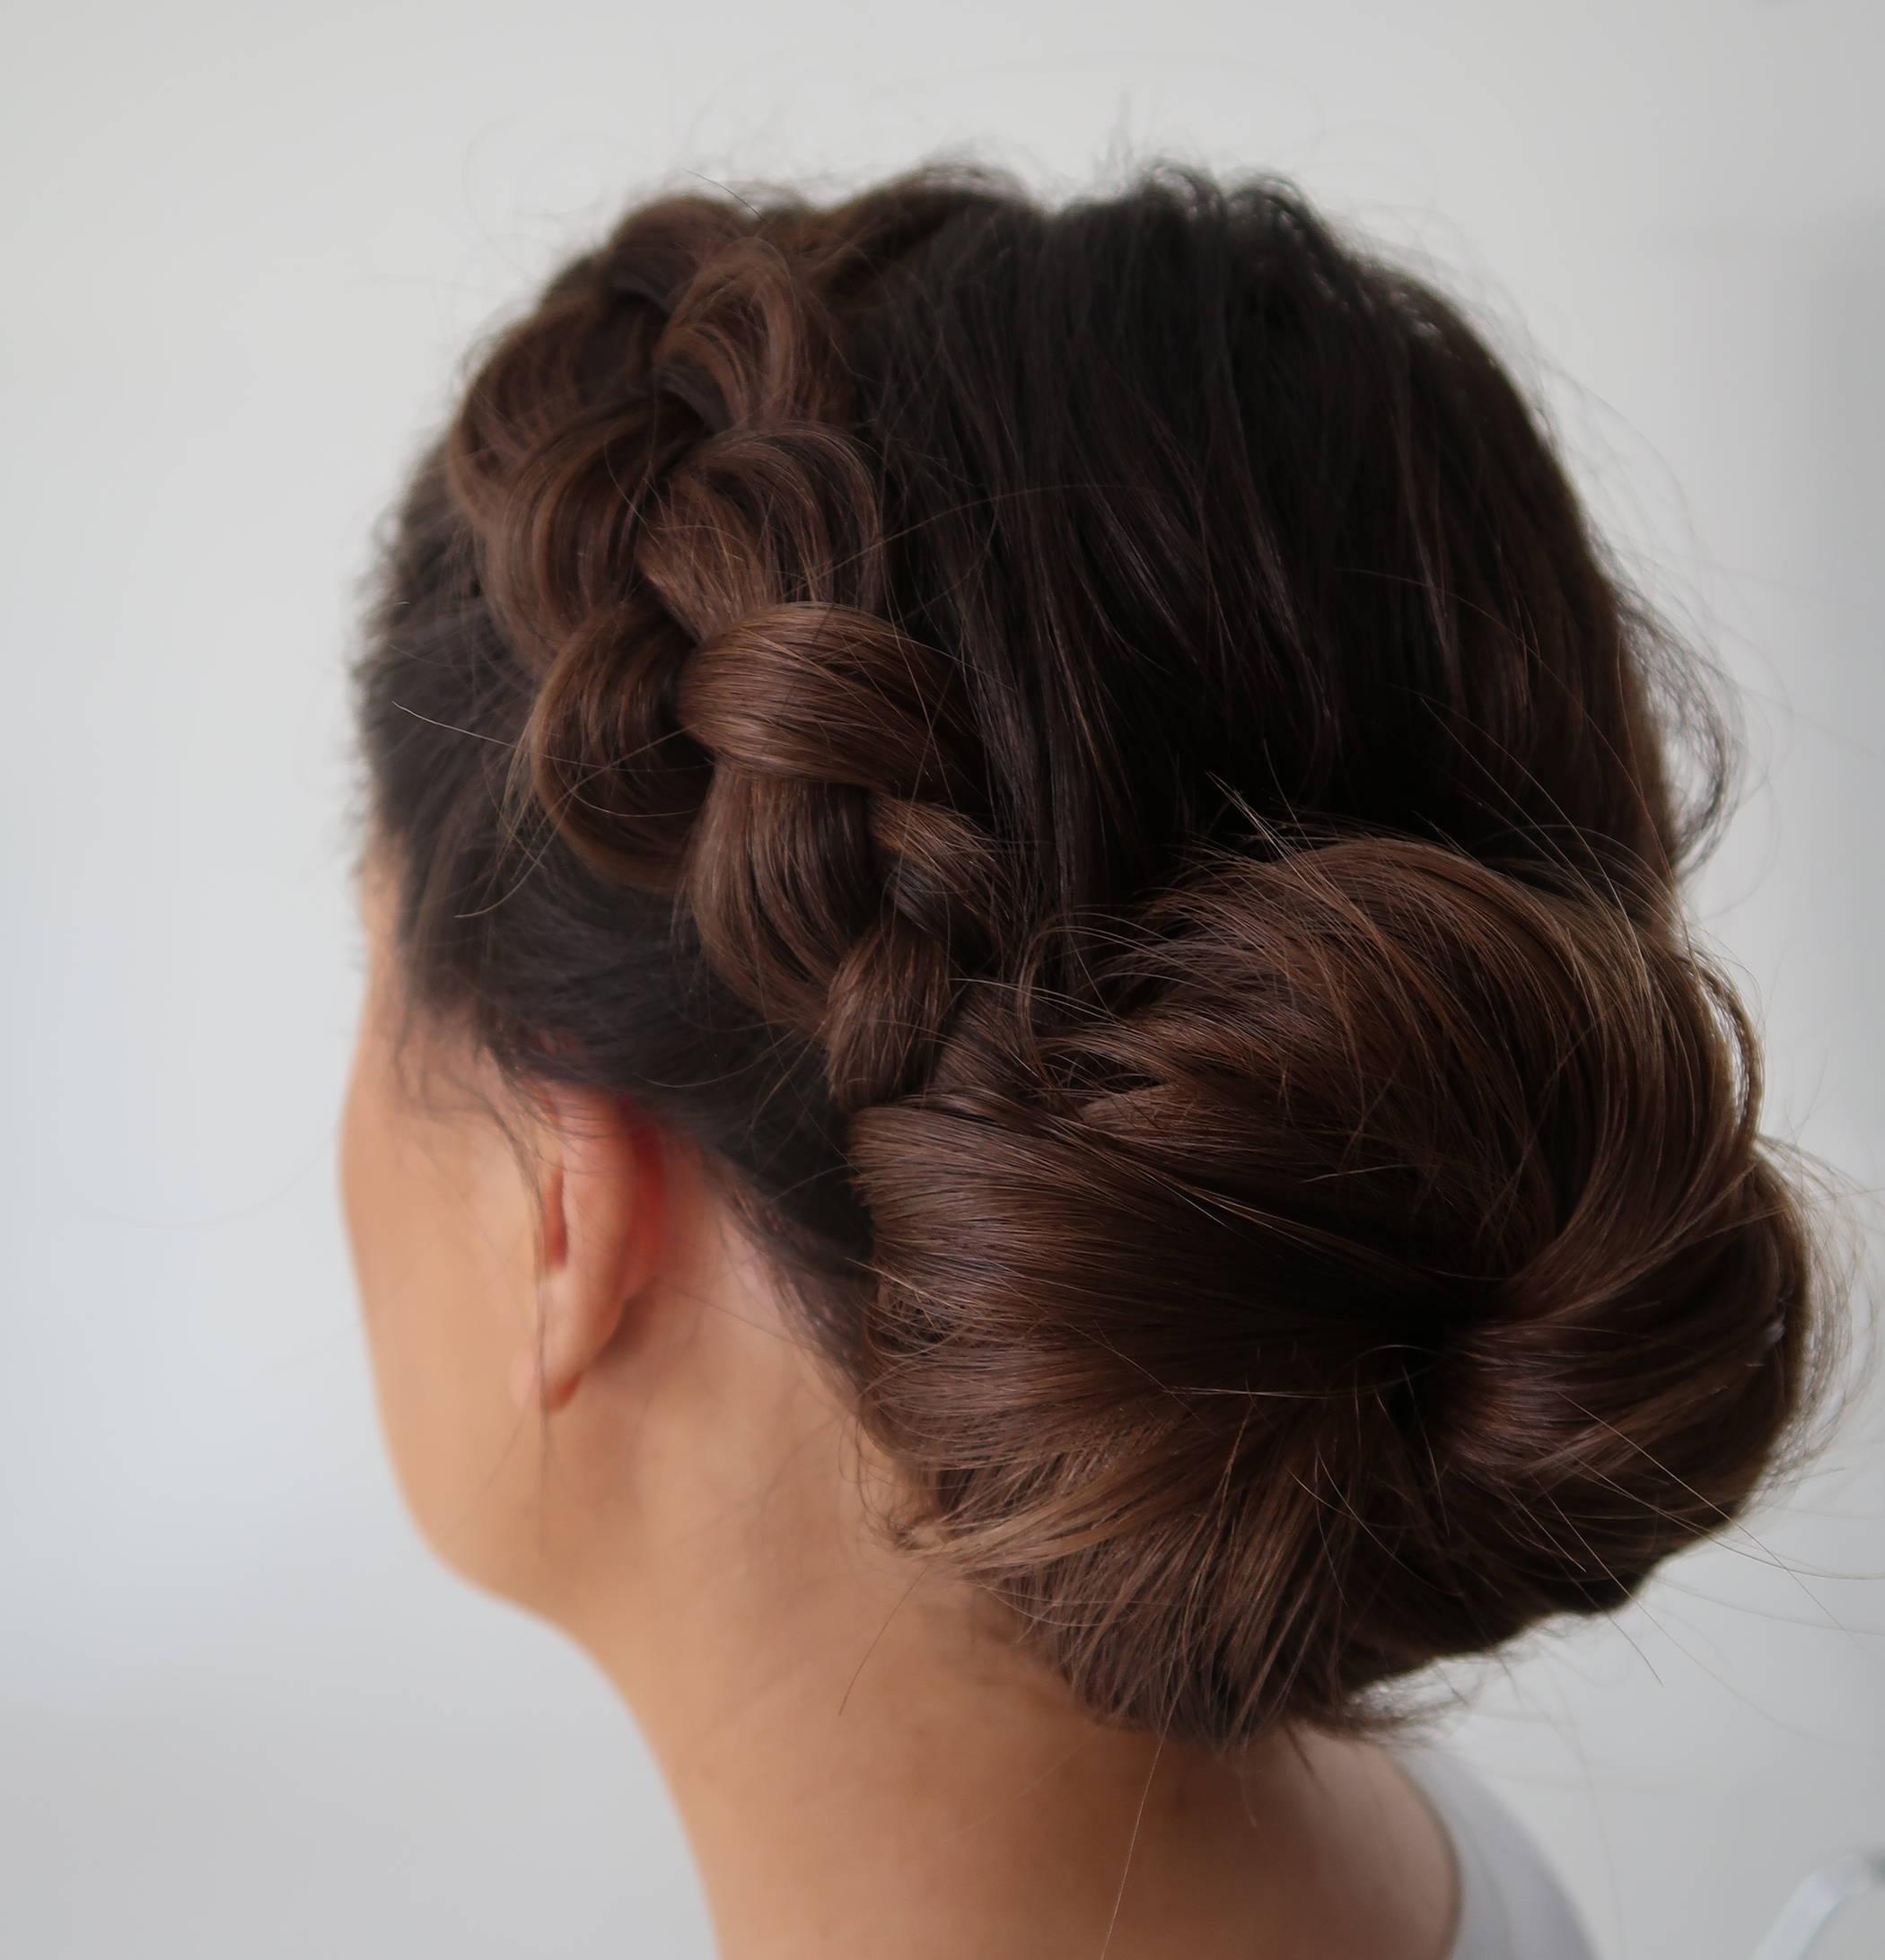 Davines braided bun tutorial how to